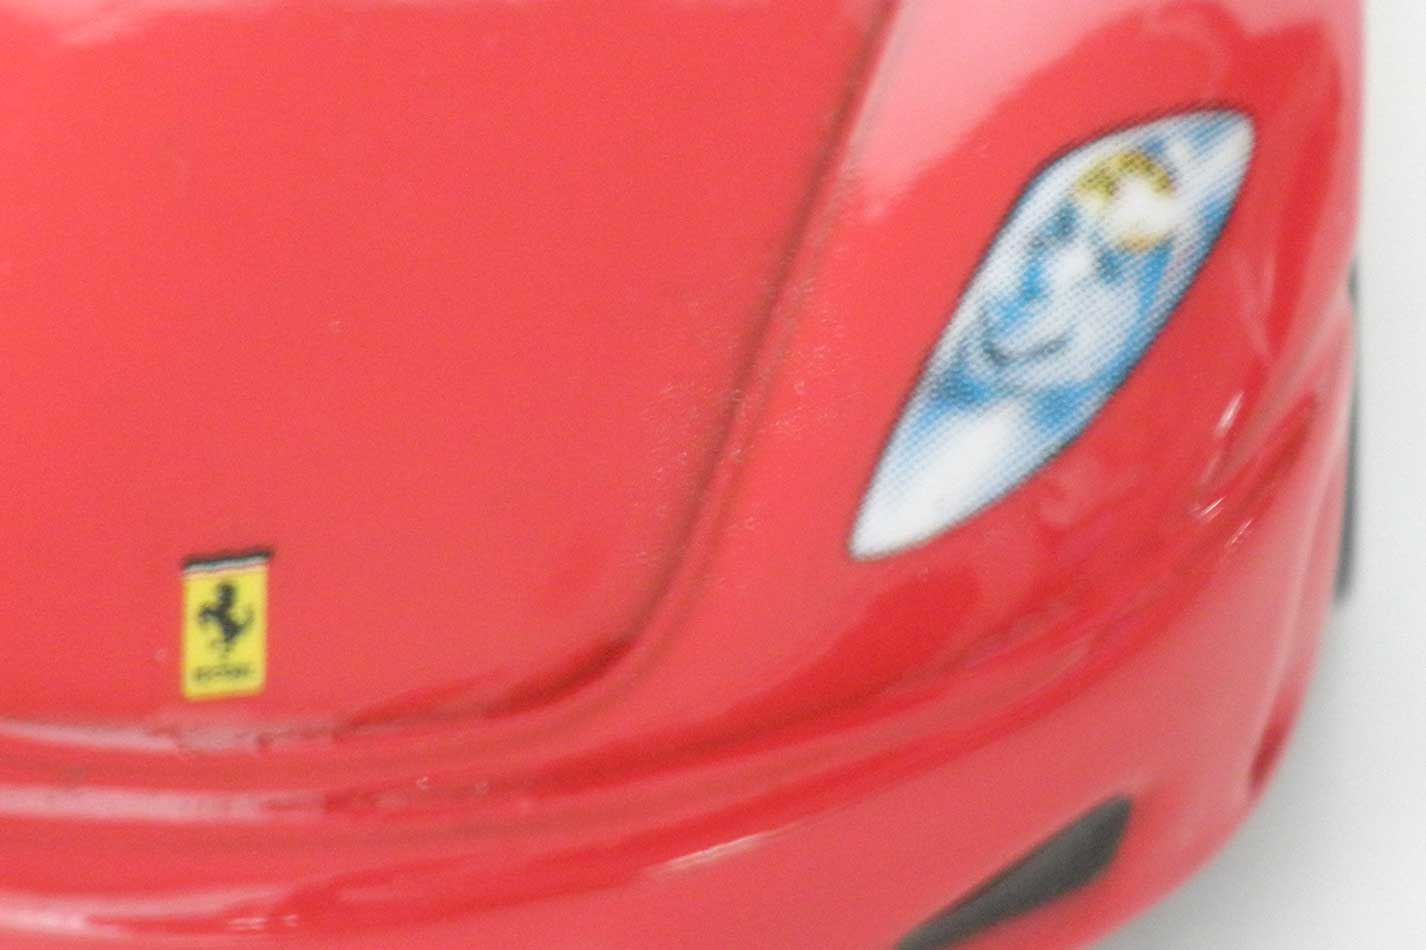 le logo Ferrari du capot est de travers.